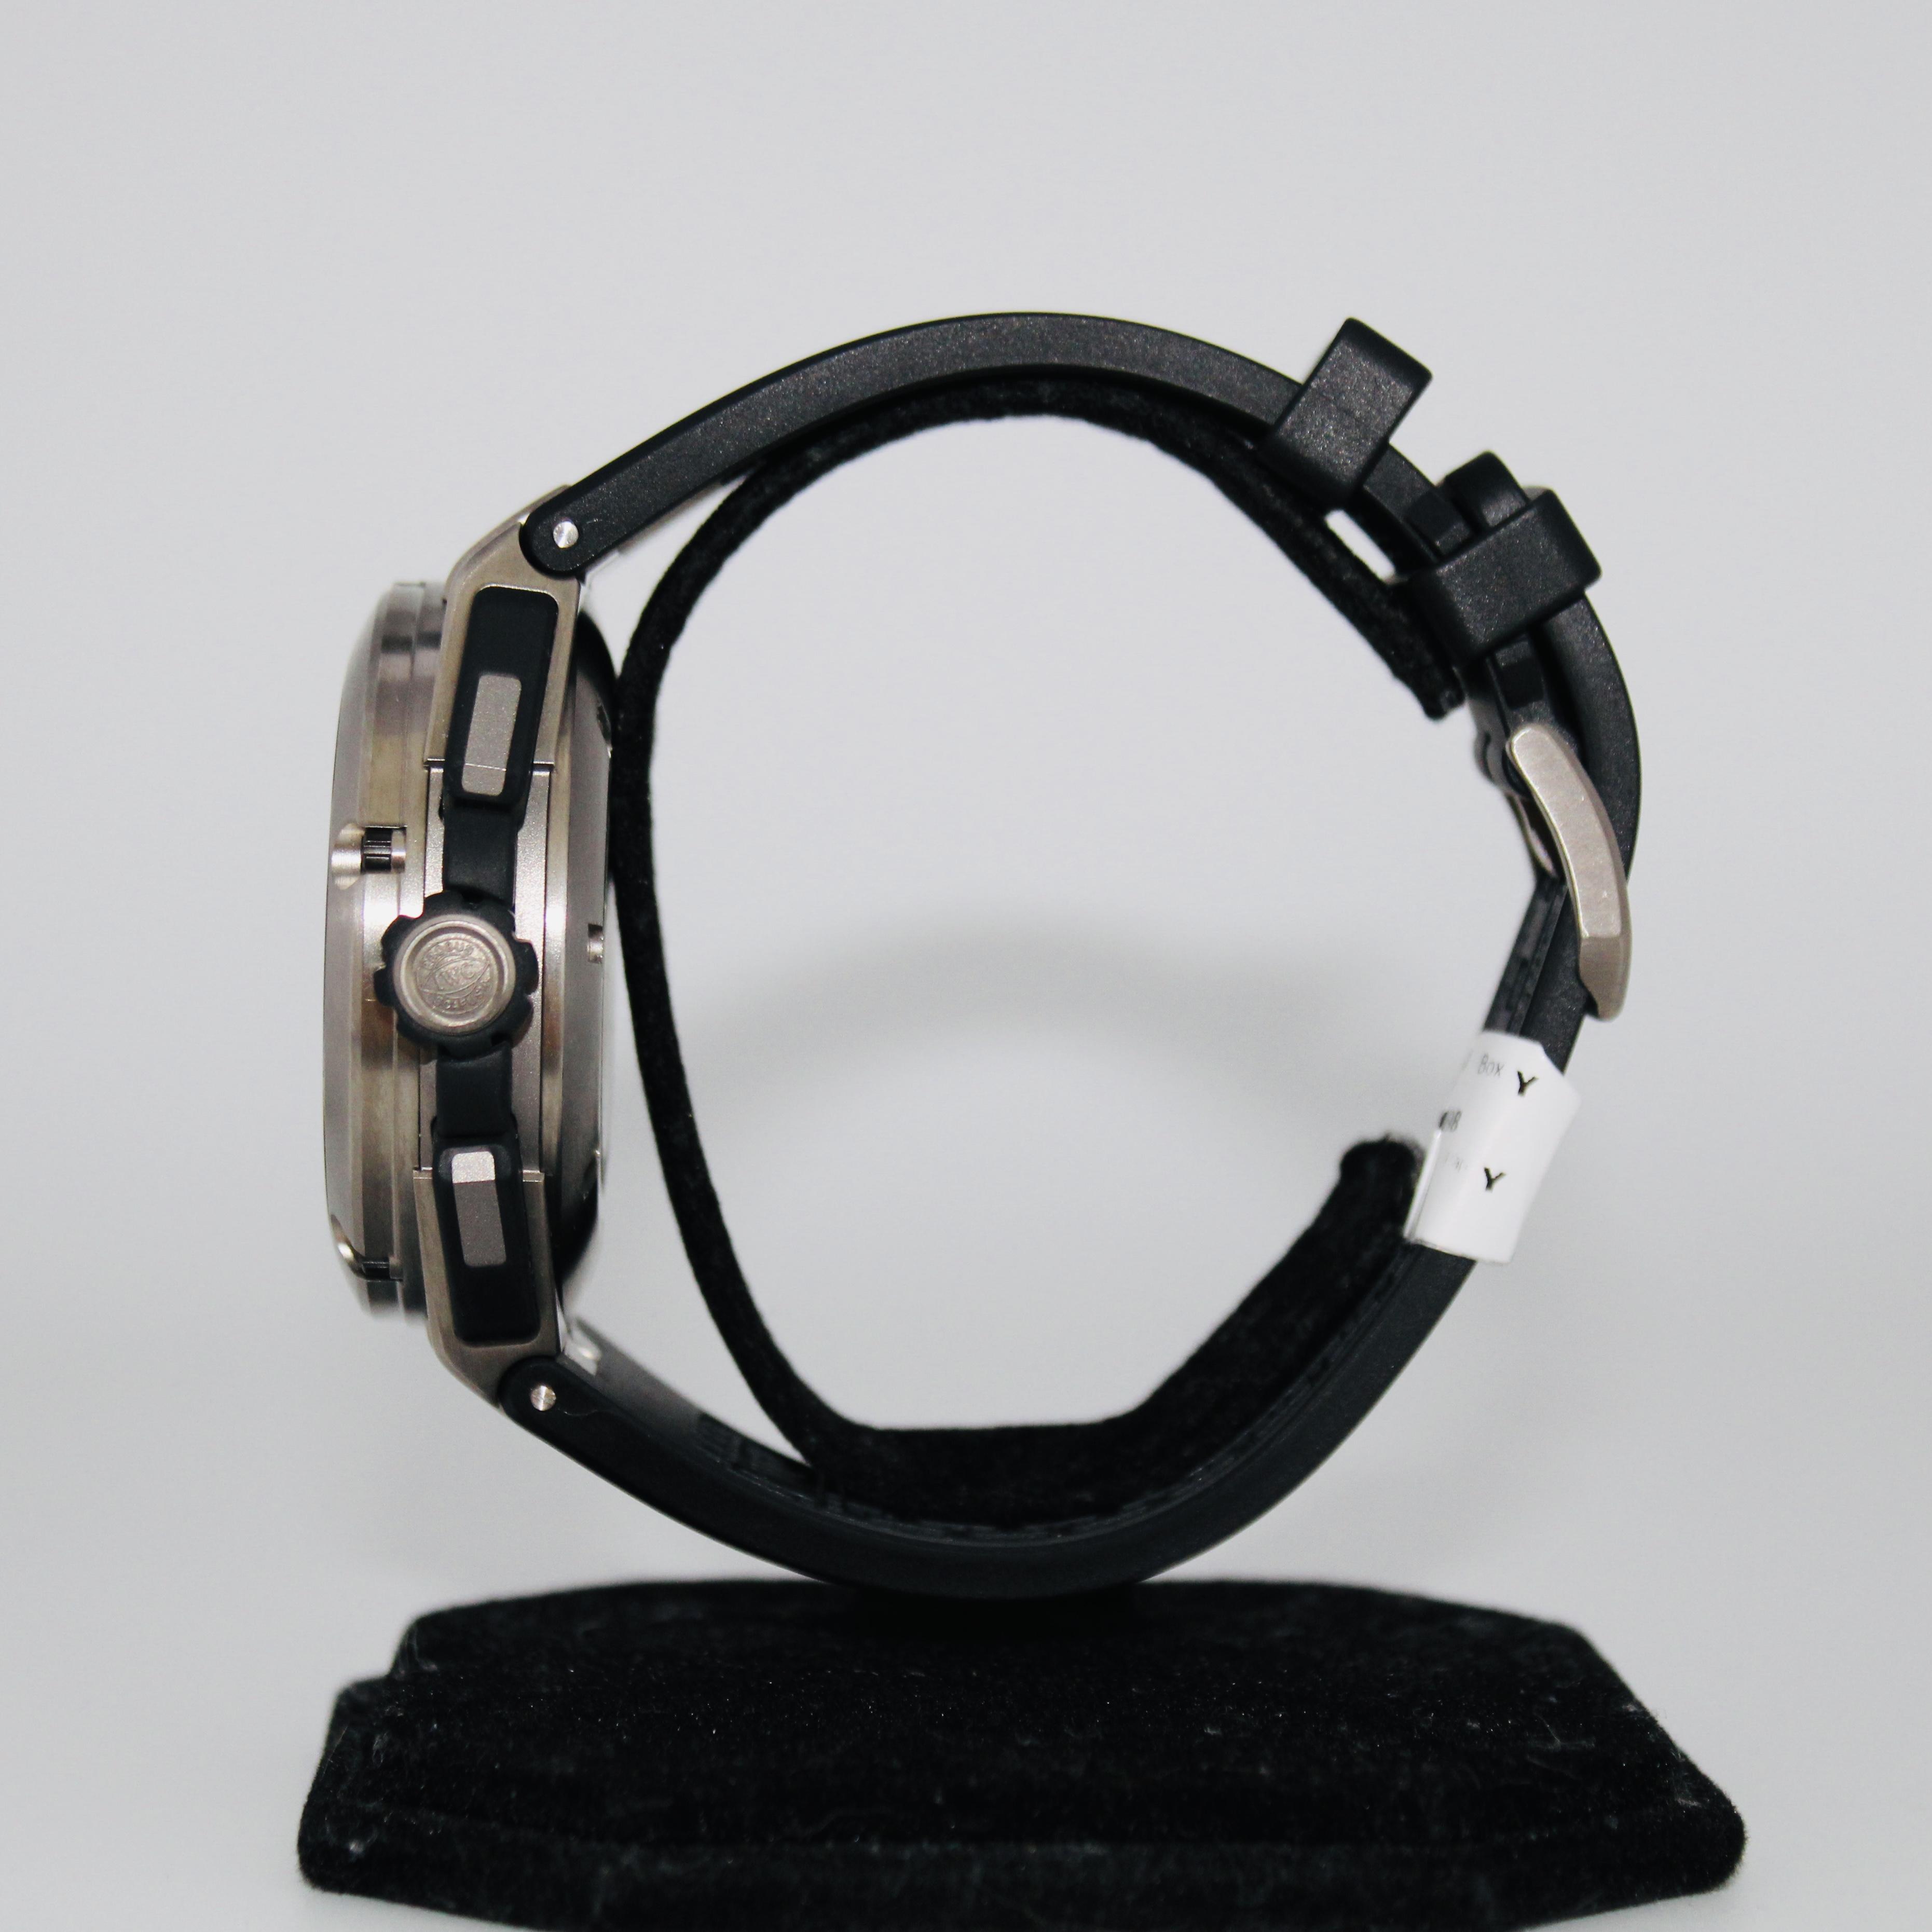 IWC Ingenieur Double Chronograph ref IW37650 - Image 3 of 5